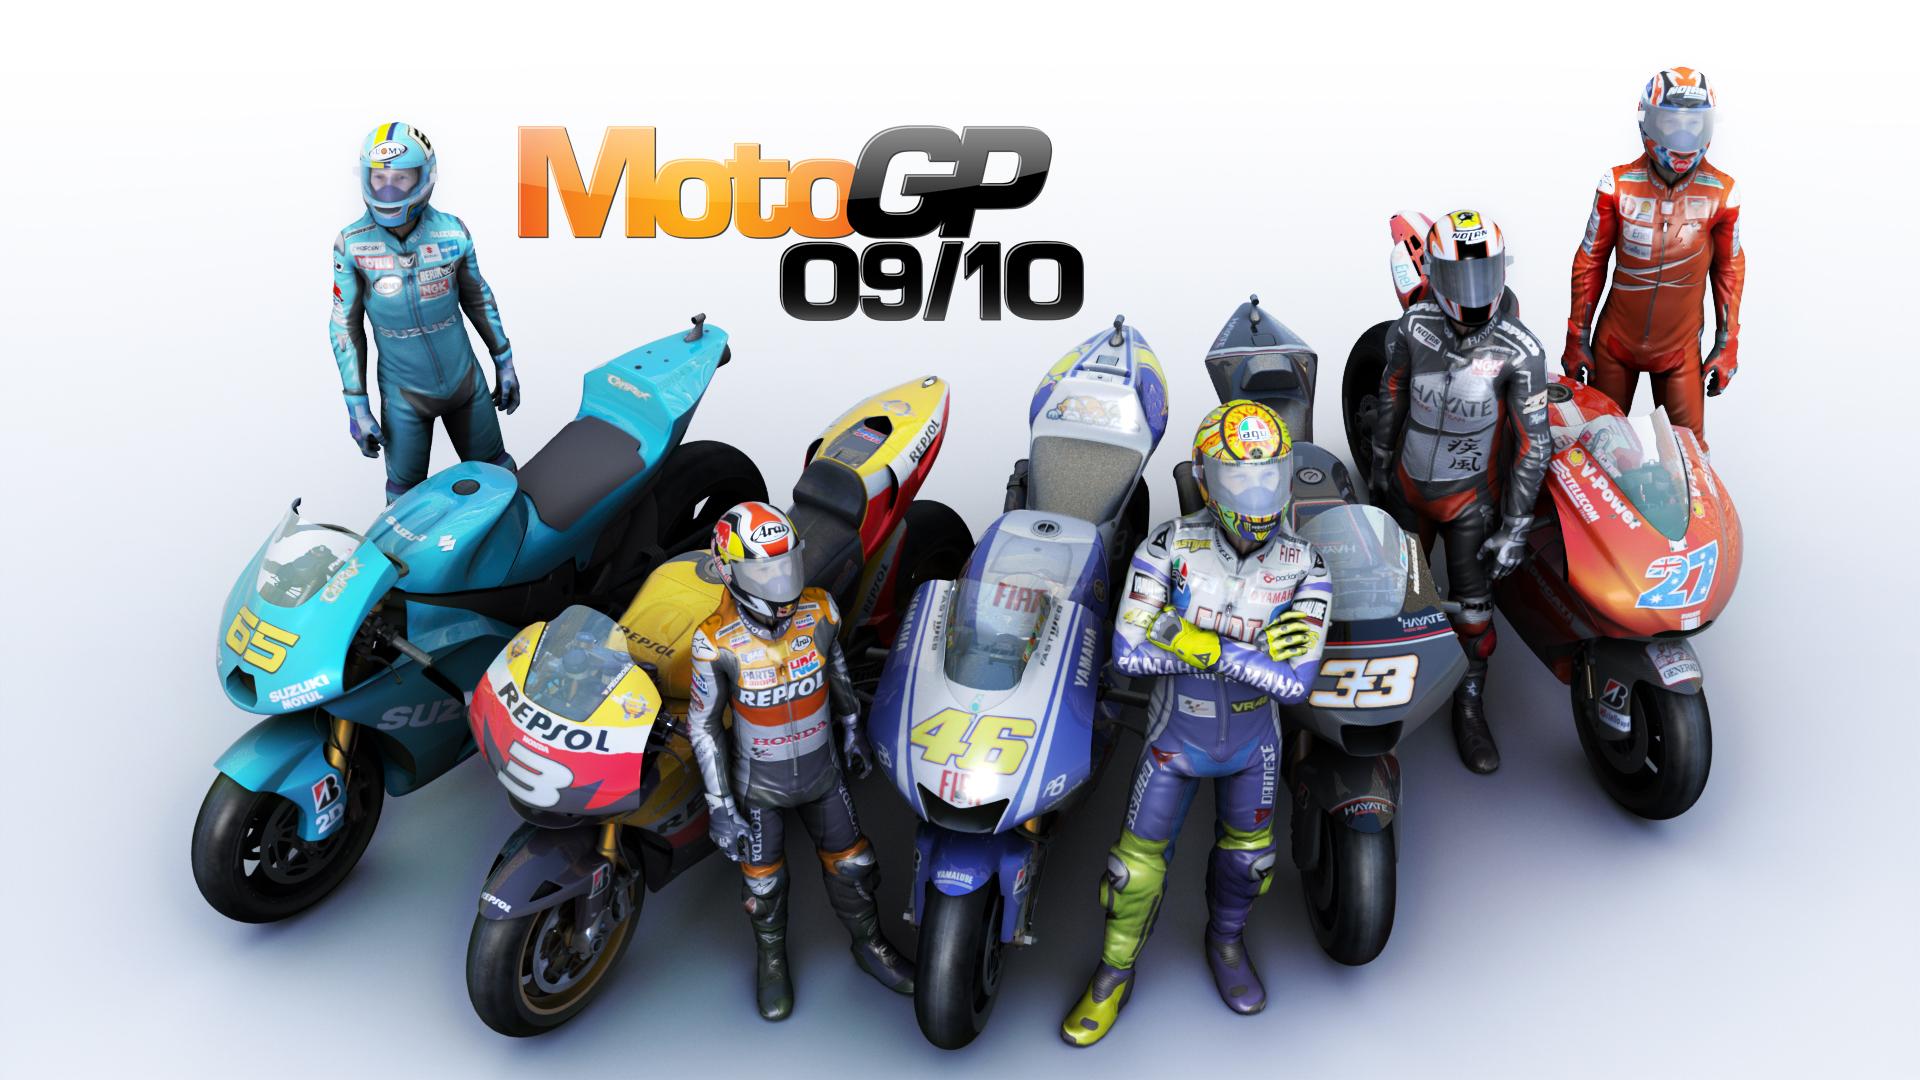 motogp09-10-16